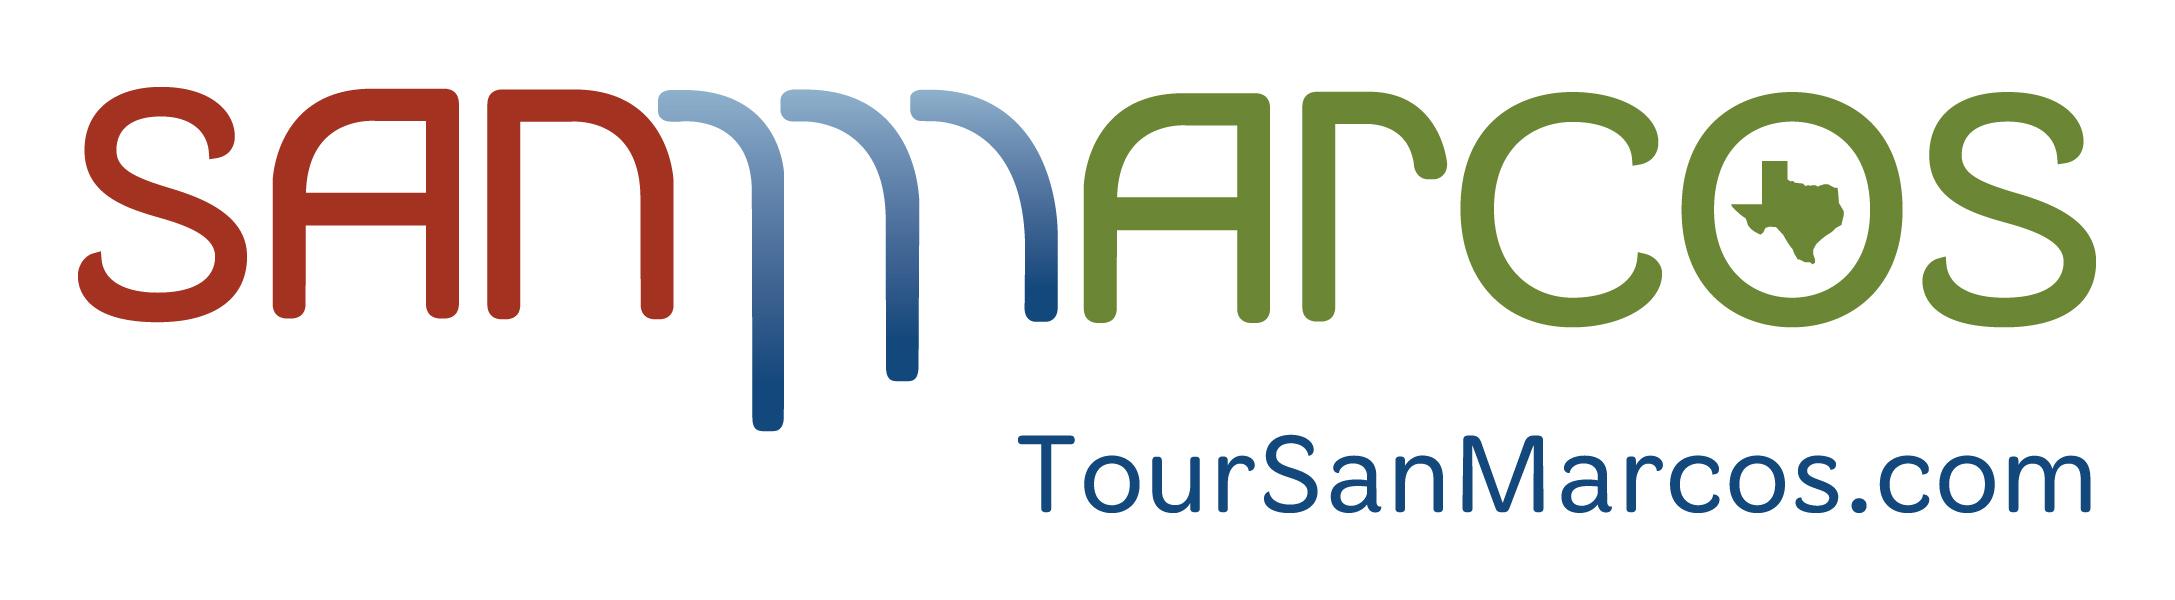 Tour San Marcos